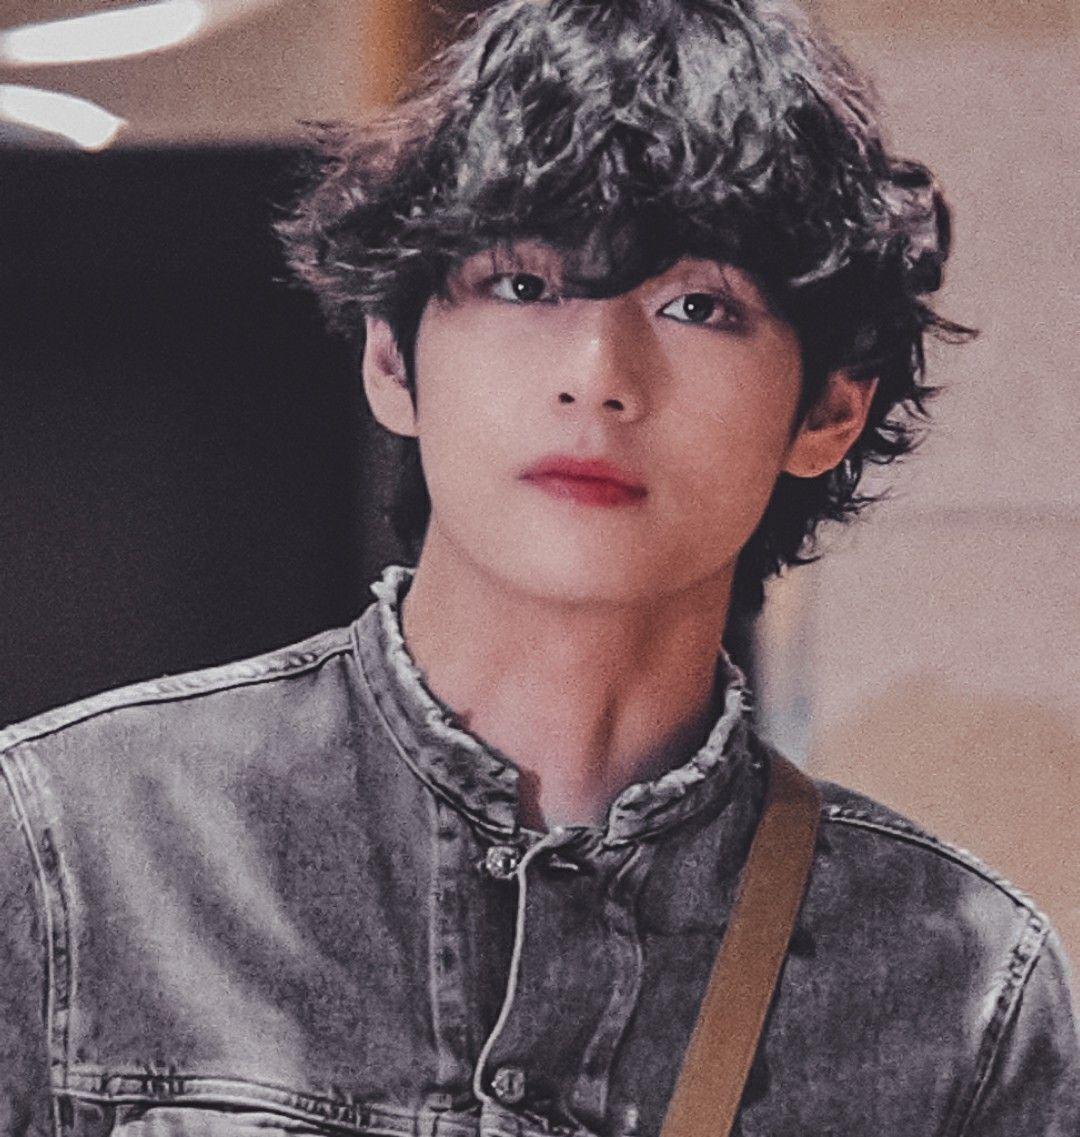 kim taehyung long hair v handsome 2020 angelica bemboom blogs